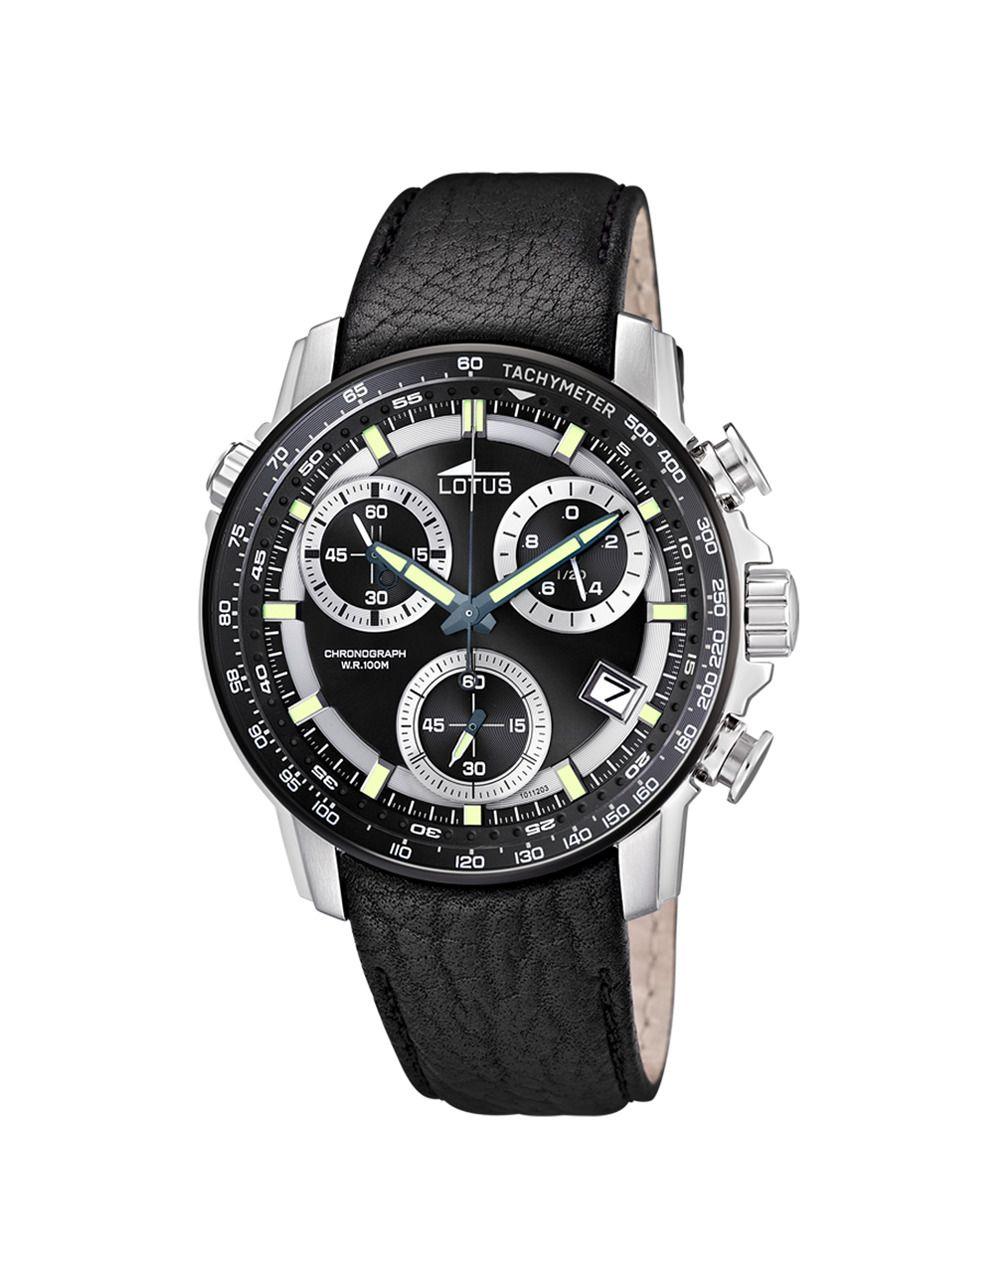 72849688133d Reloj de hombre Lotus - Hombre - Relojes - El Corte Inglés - Moda ...